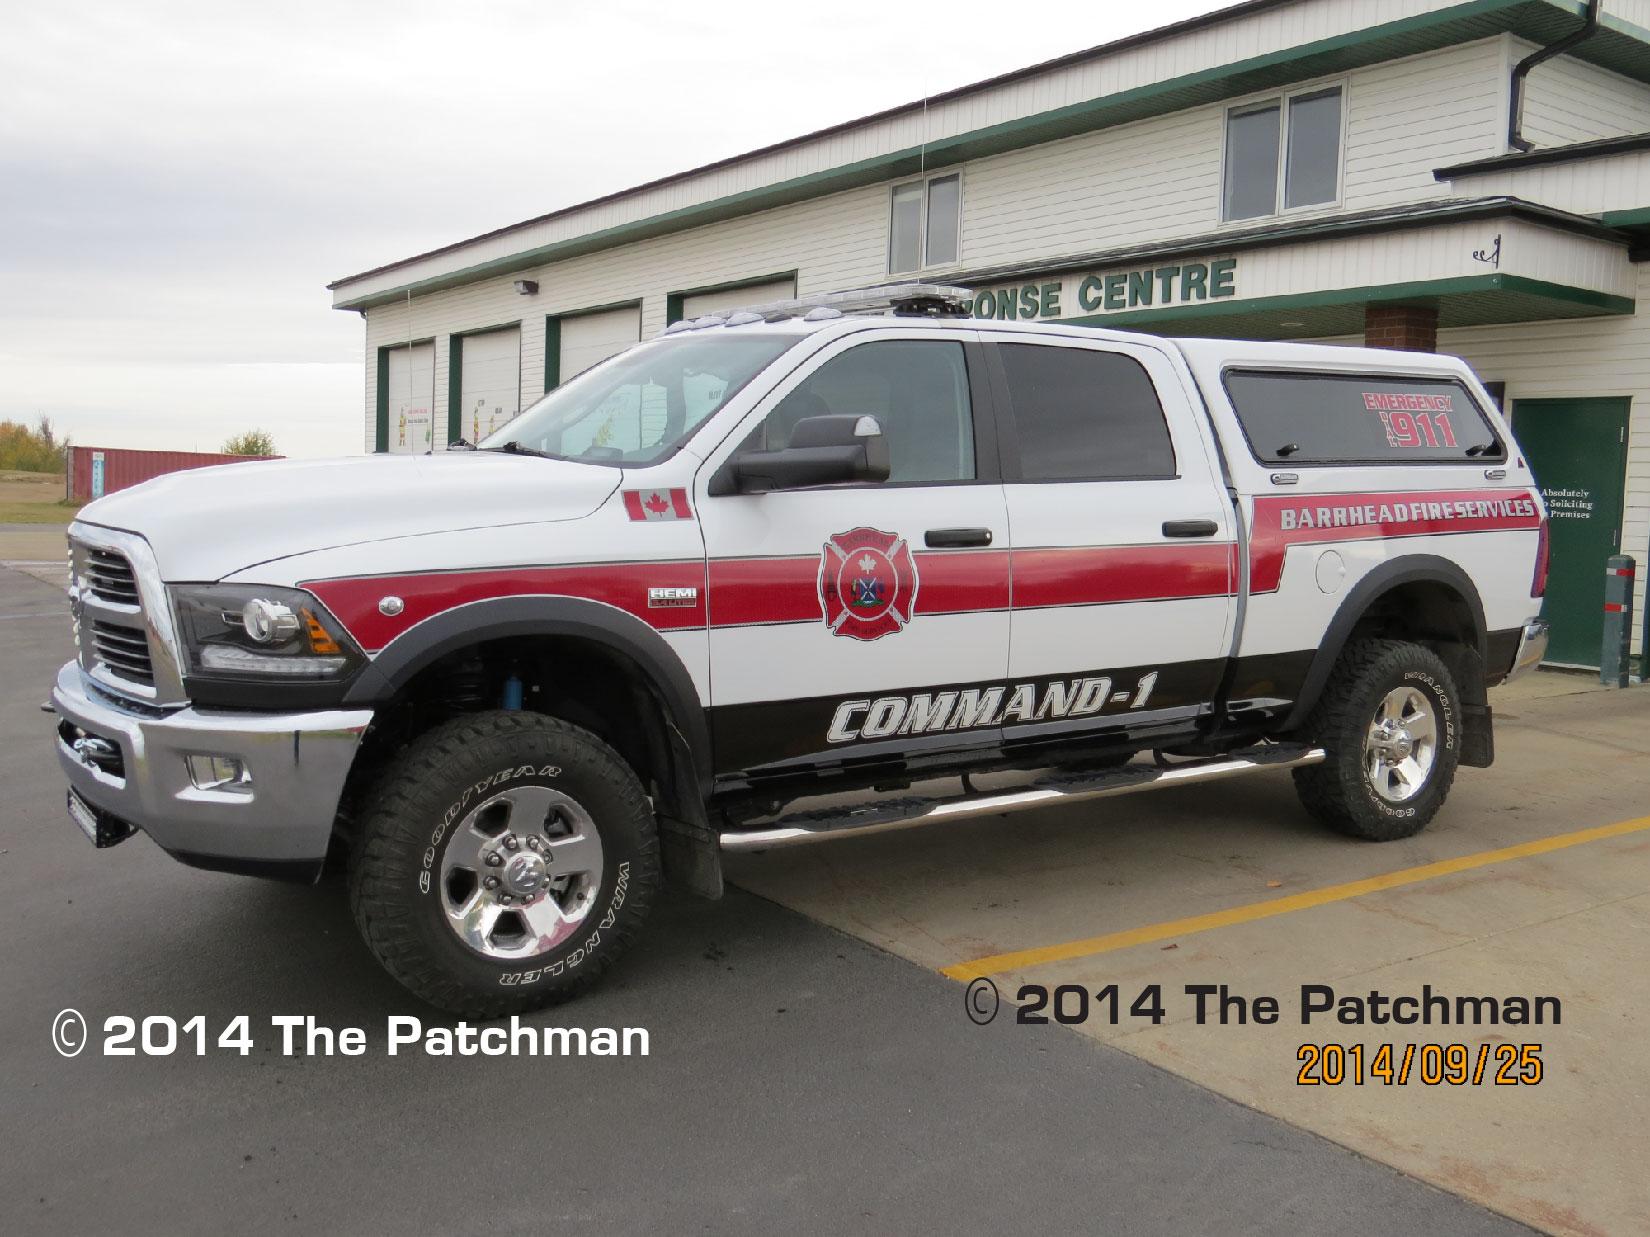 Barrhead Fire Command